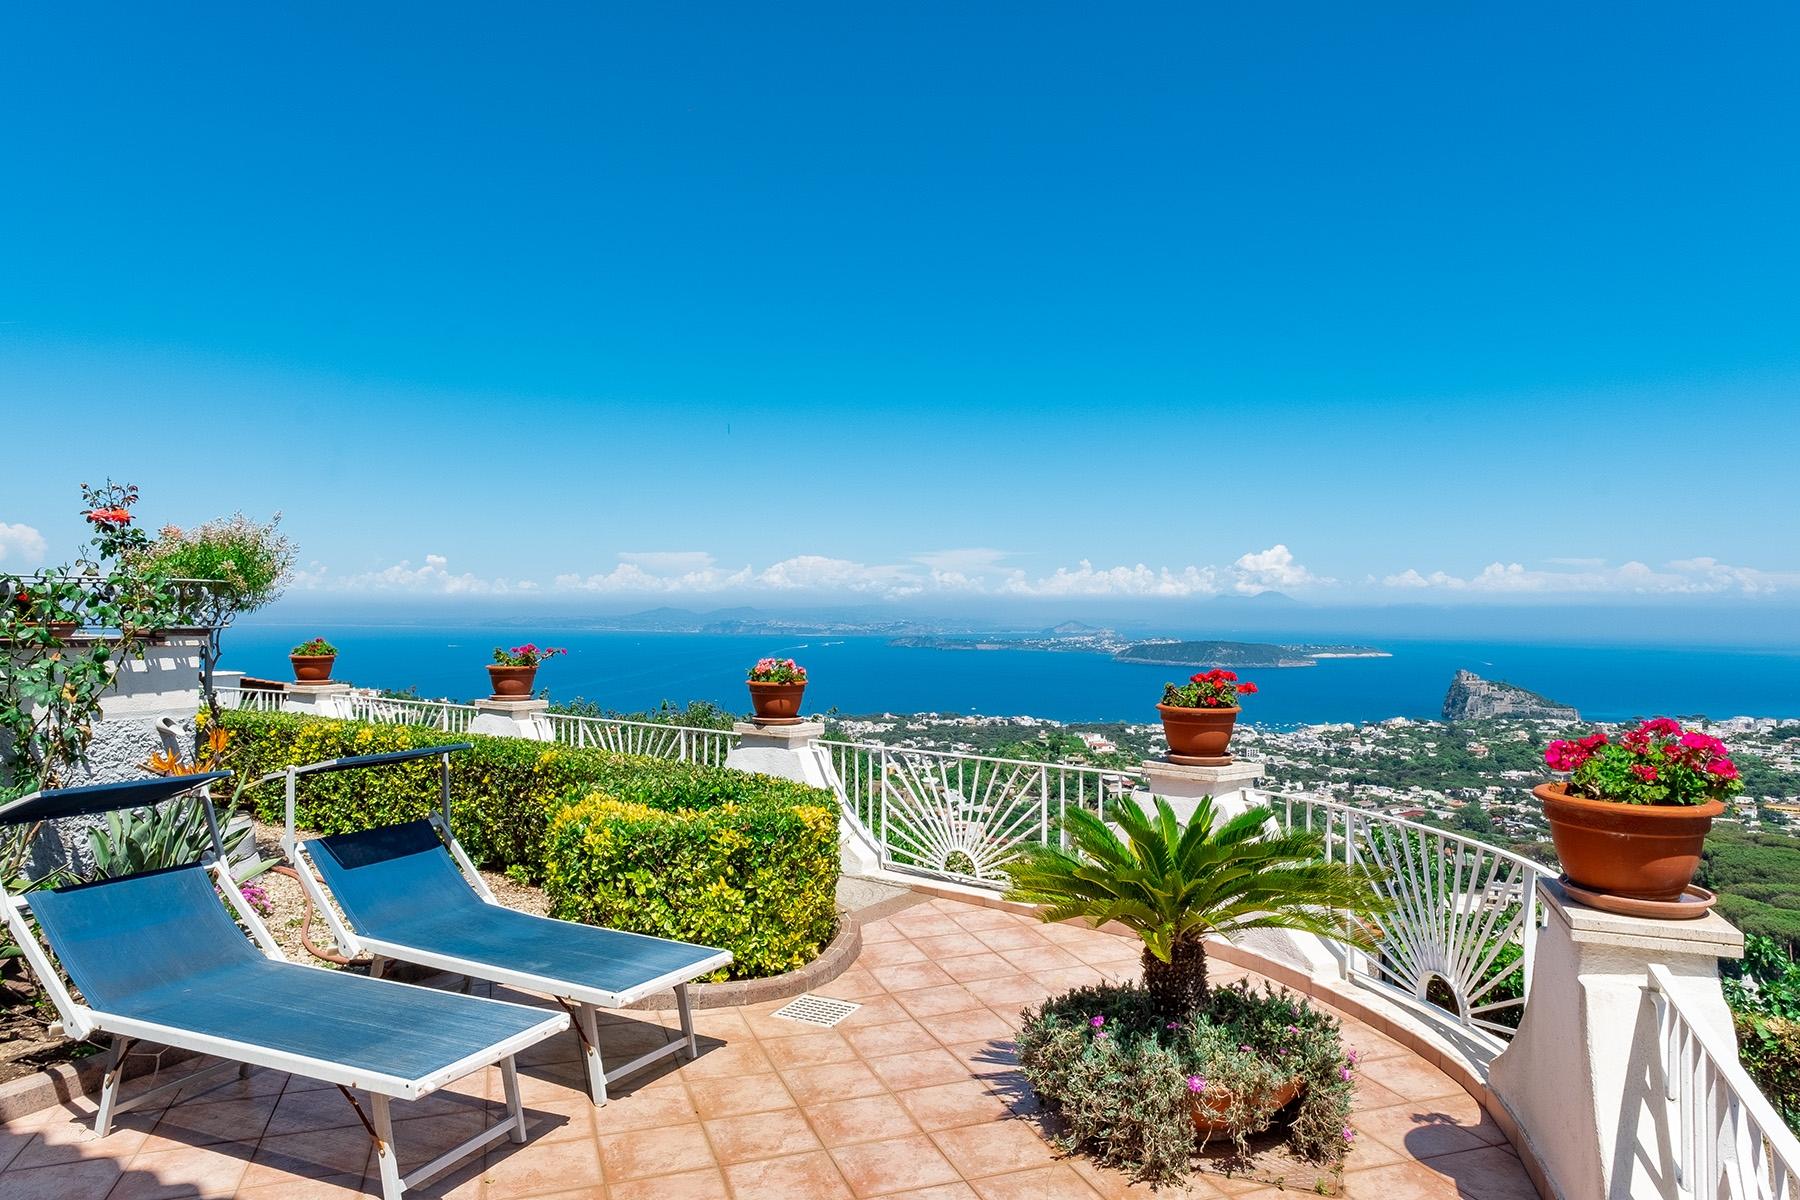 Villa in Vendita a Ischia: 5 locali, 138 mq - Foto 5